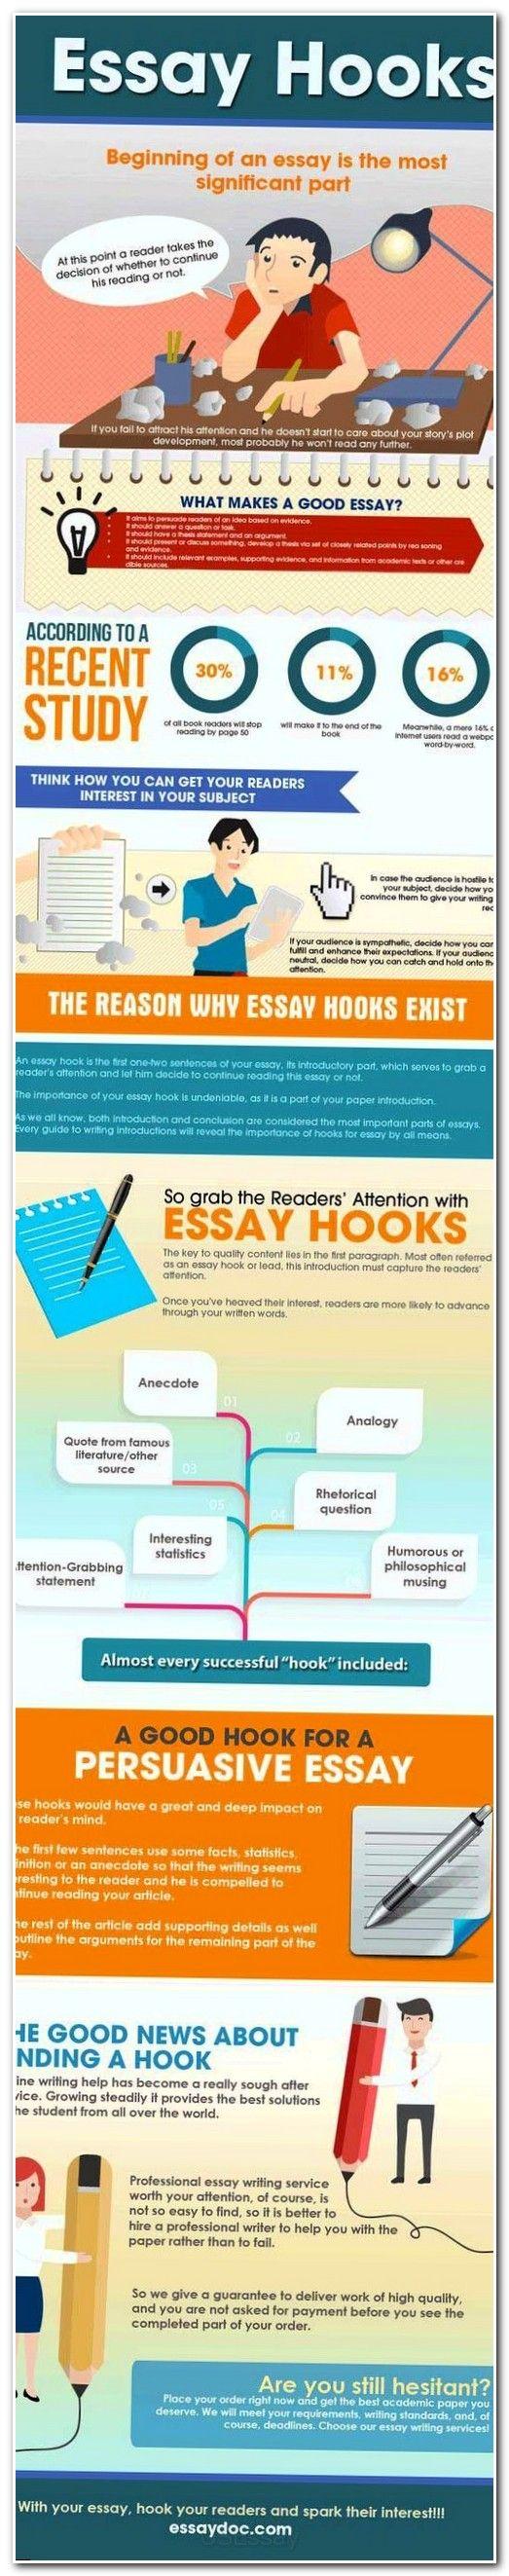 essay essayuniversity thesis writing help persuasive paragraph essay essayuniversity thesis writing help persuasive paragraph writing a short paragraph on